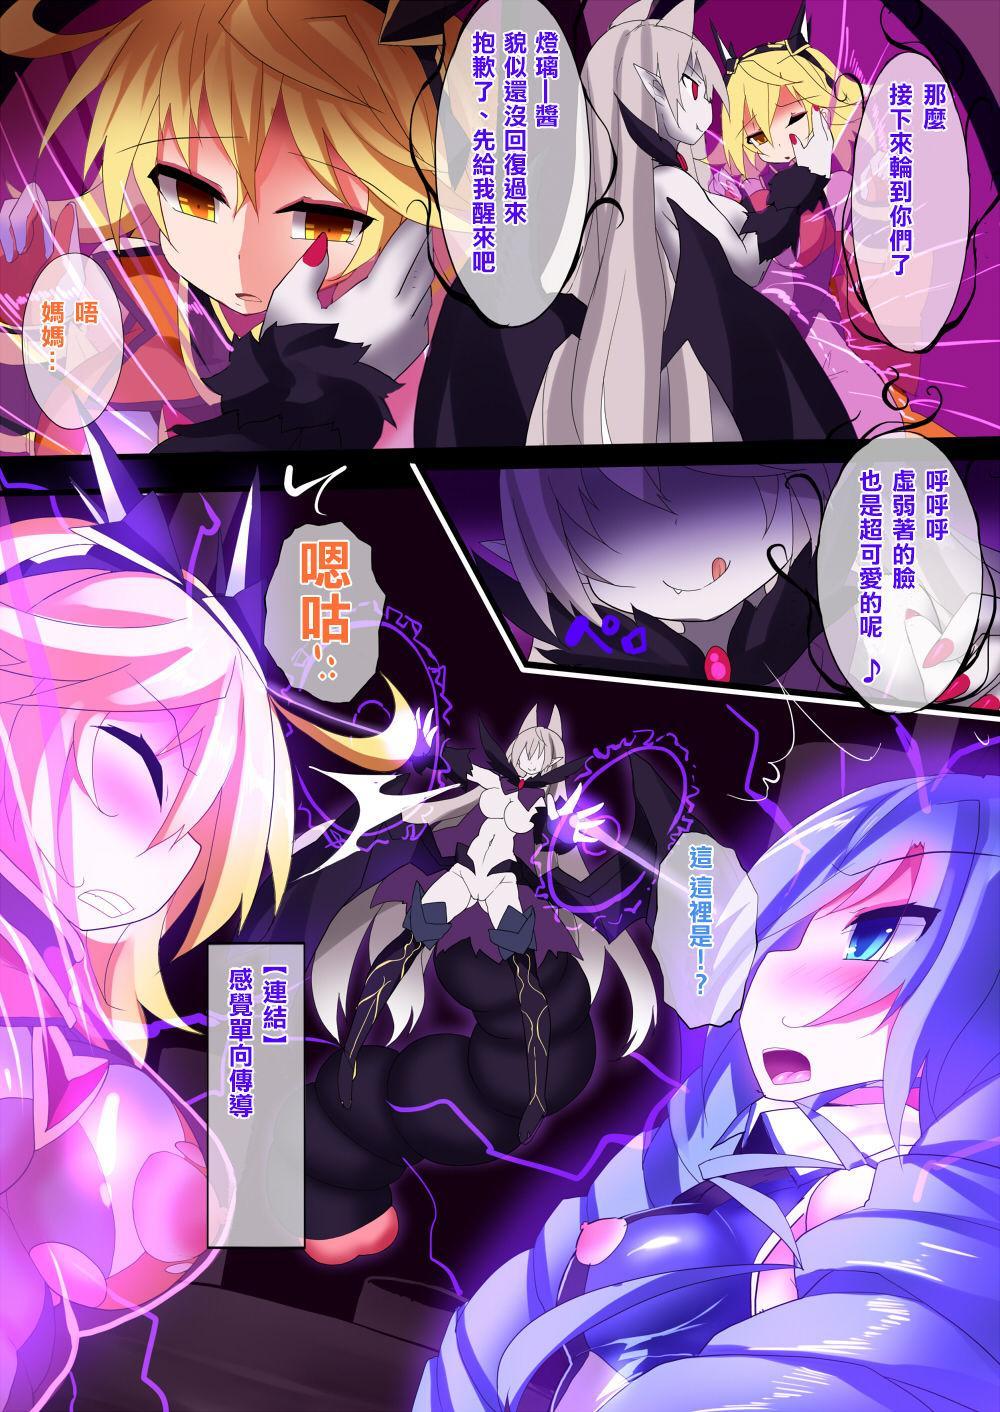 [Makutsutei (Nagai Wataru)] Orgasm Unit EX -Mahou Senshi Akari Ch. 1-5 [Chinese] [这很恶堕 x Lolipoi汉化组] 131